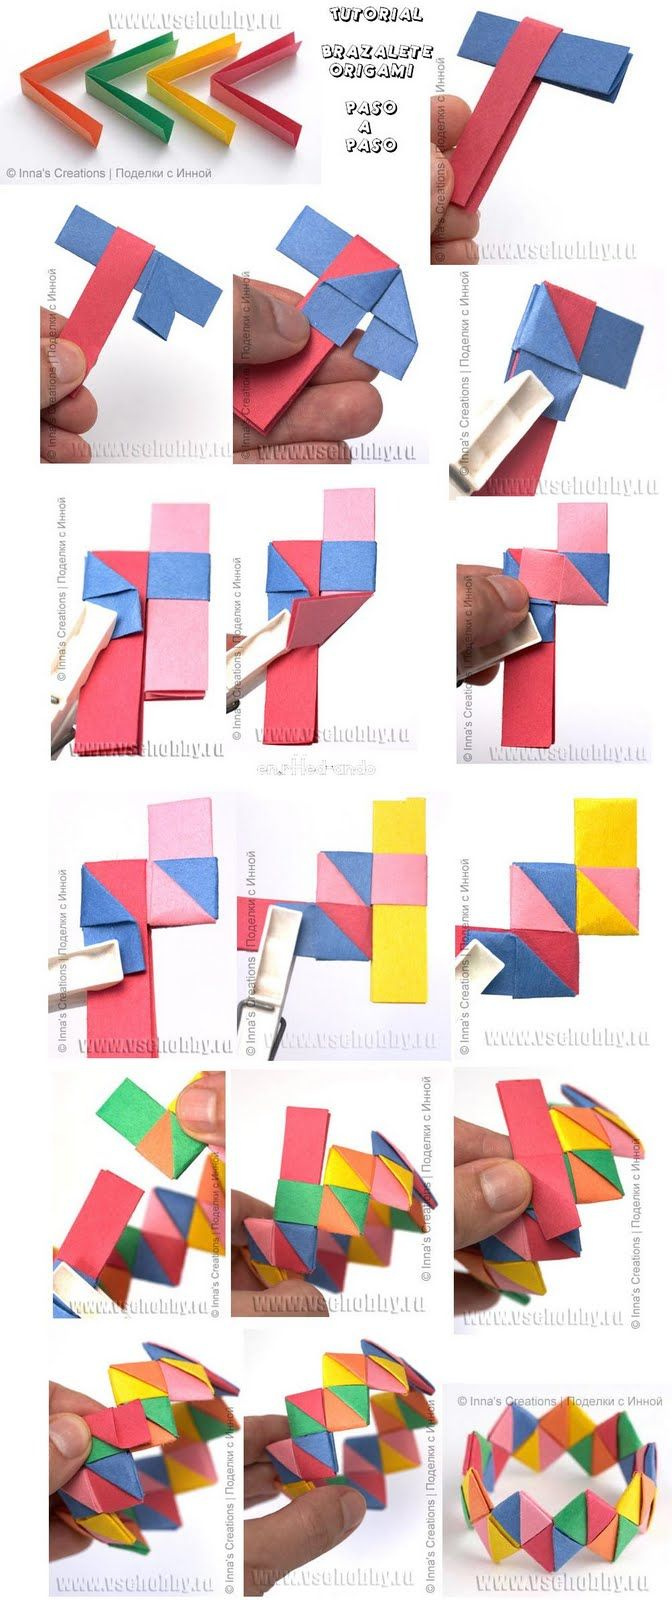 M s de 25 ideas fant sticas sobre flores de origami en - Manualidades desde casa ...